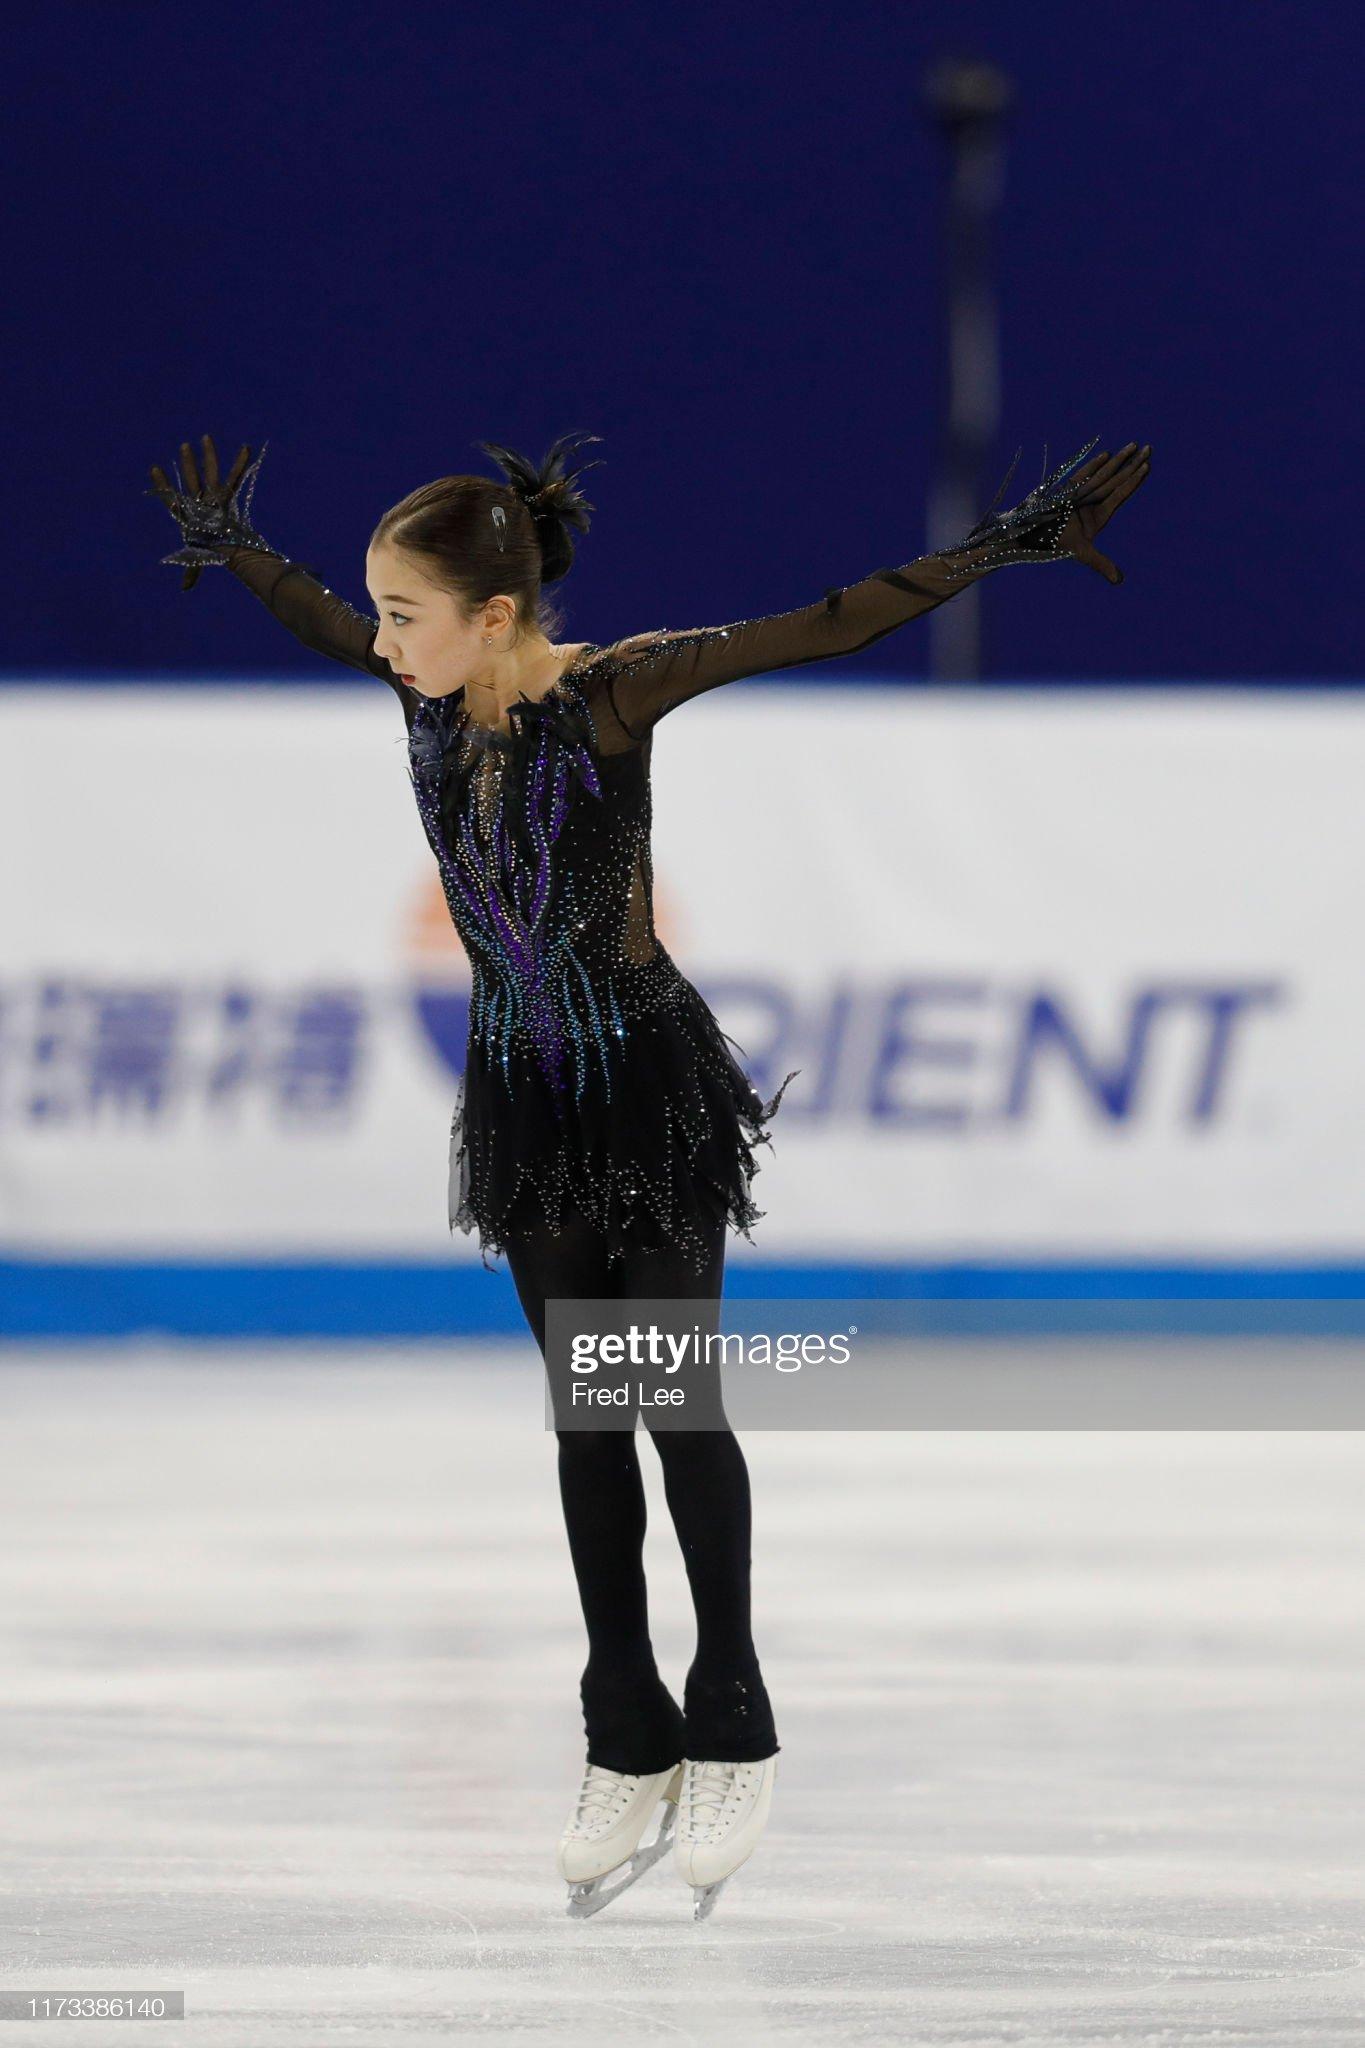 Shanghai Trophy (Invitational). 3-5 октября 2019. Шанхай (Китай) - Страница 3 Elizabet-tursynbaeva-of-kazakhstan-competes-in-the-ladies-short-the-picture-id1173386140?s=2048x2048